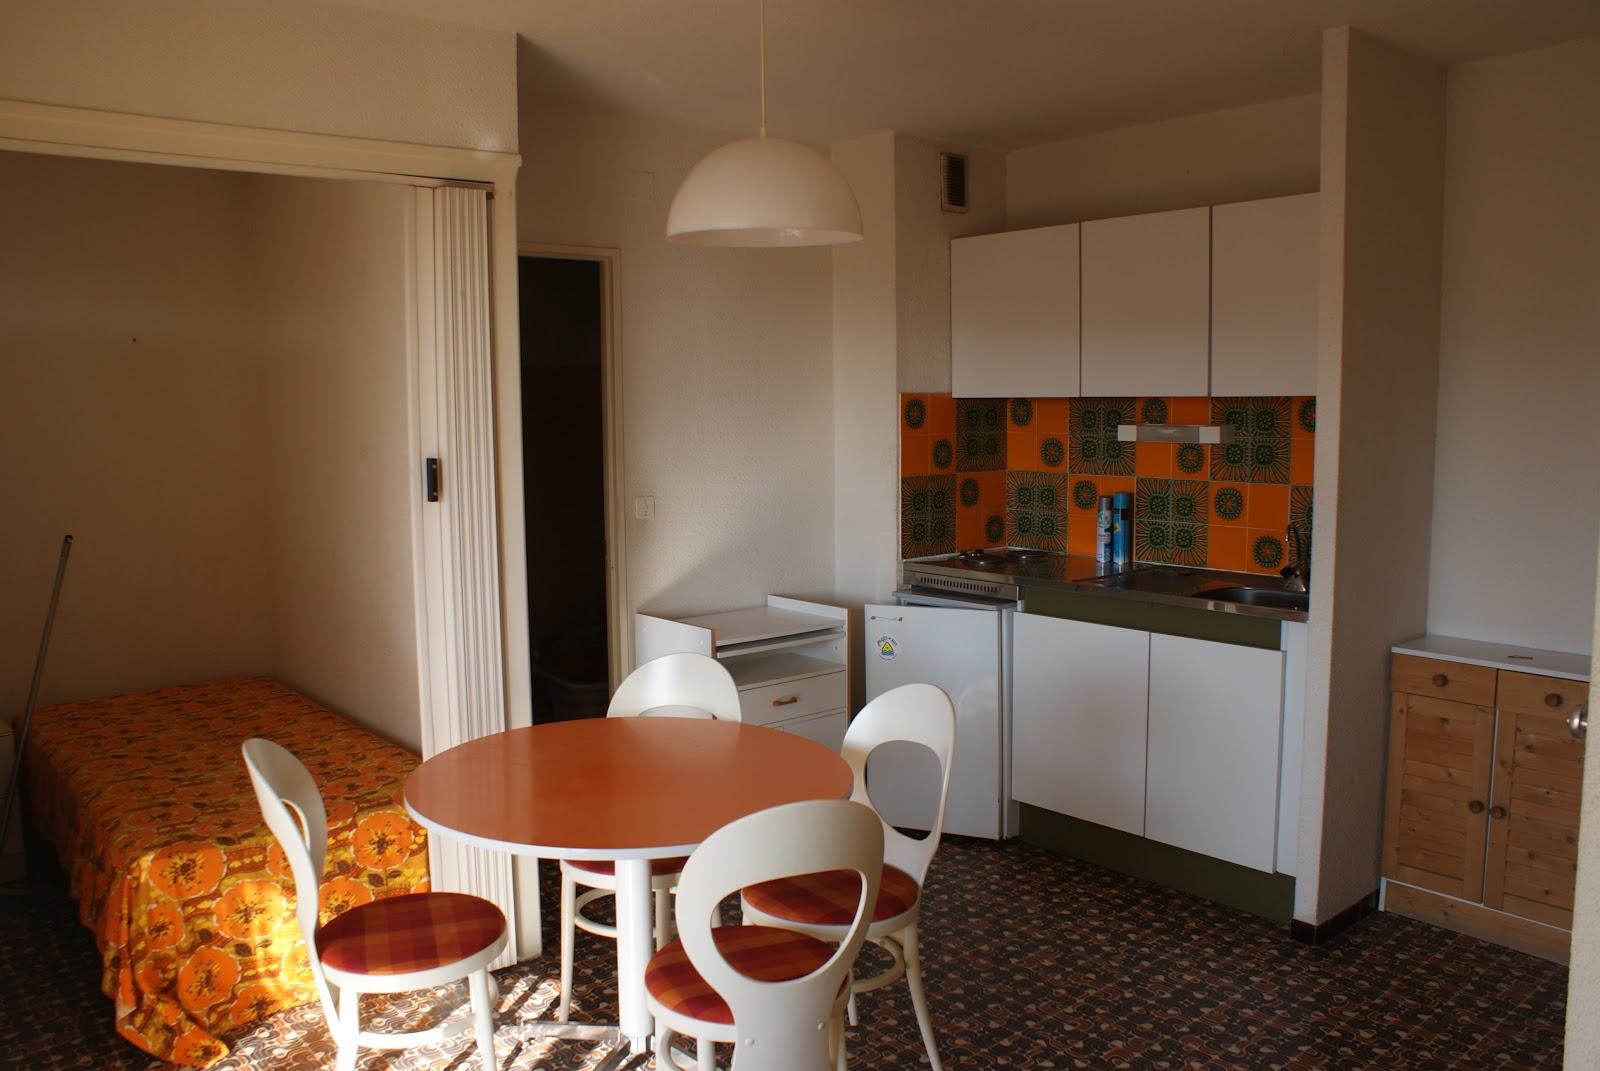 relooking appartement avant int dsgn. Black Bedroom Furniture Sets. Home Design Ideas